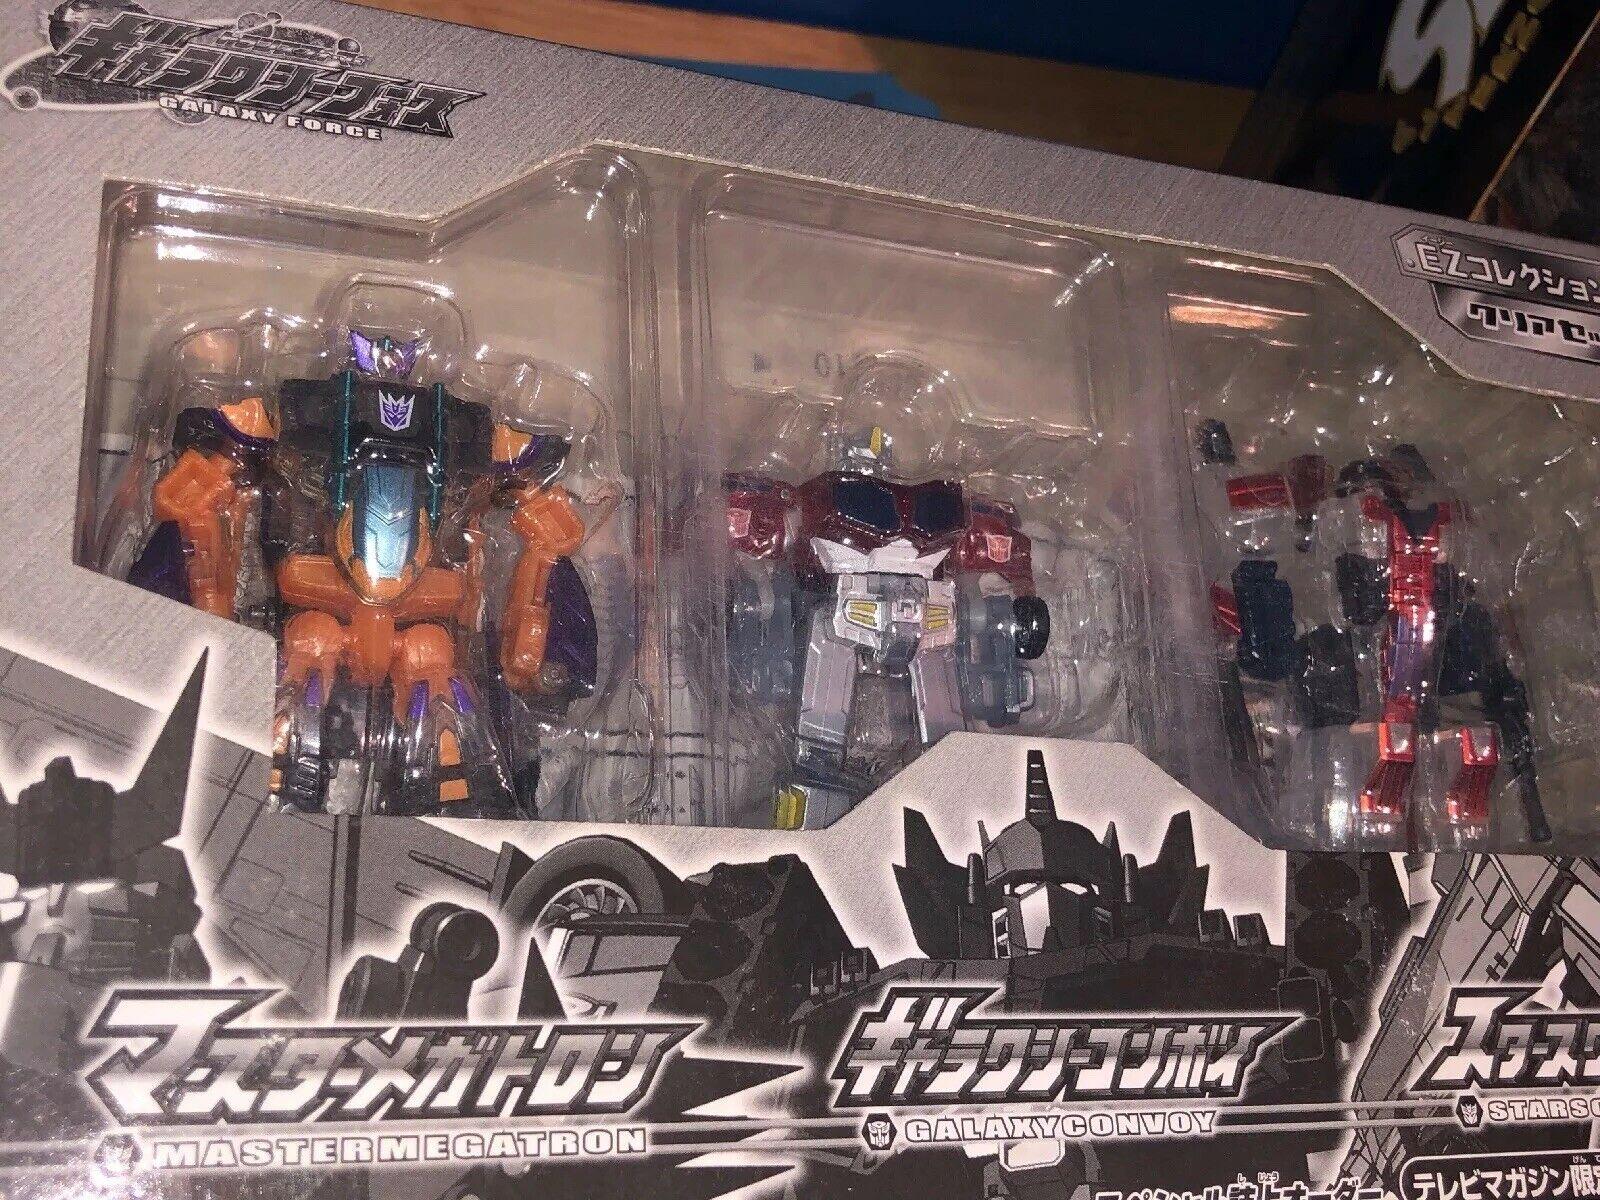 Galaxy Force Dengeki Hobby EZ Collection Galvatron Optimus Prime Starscream